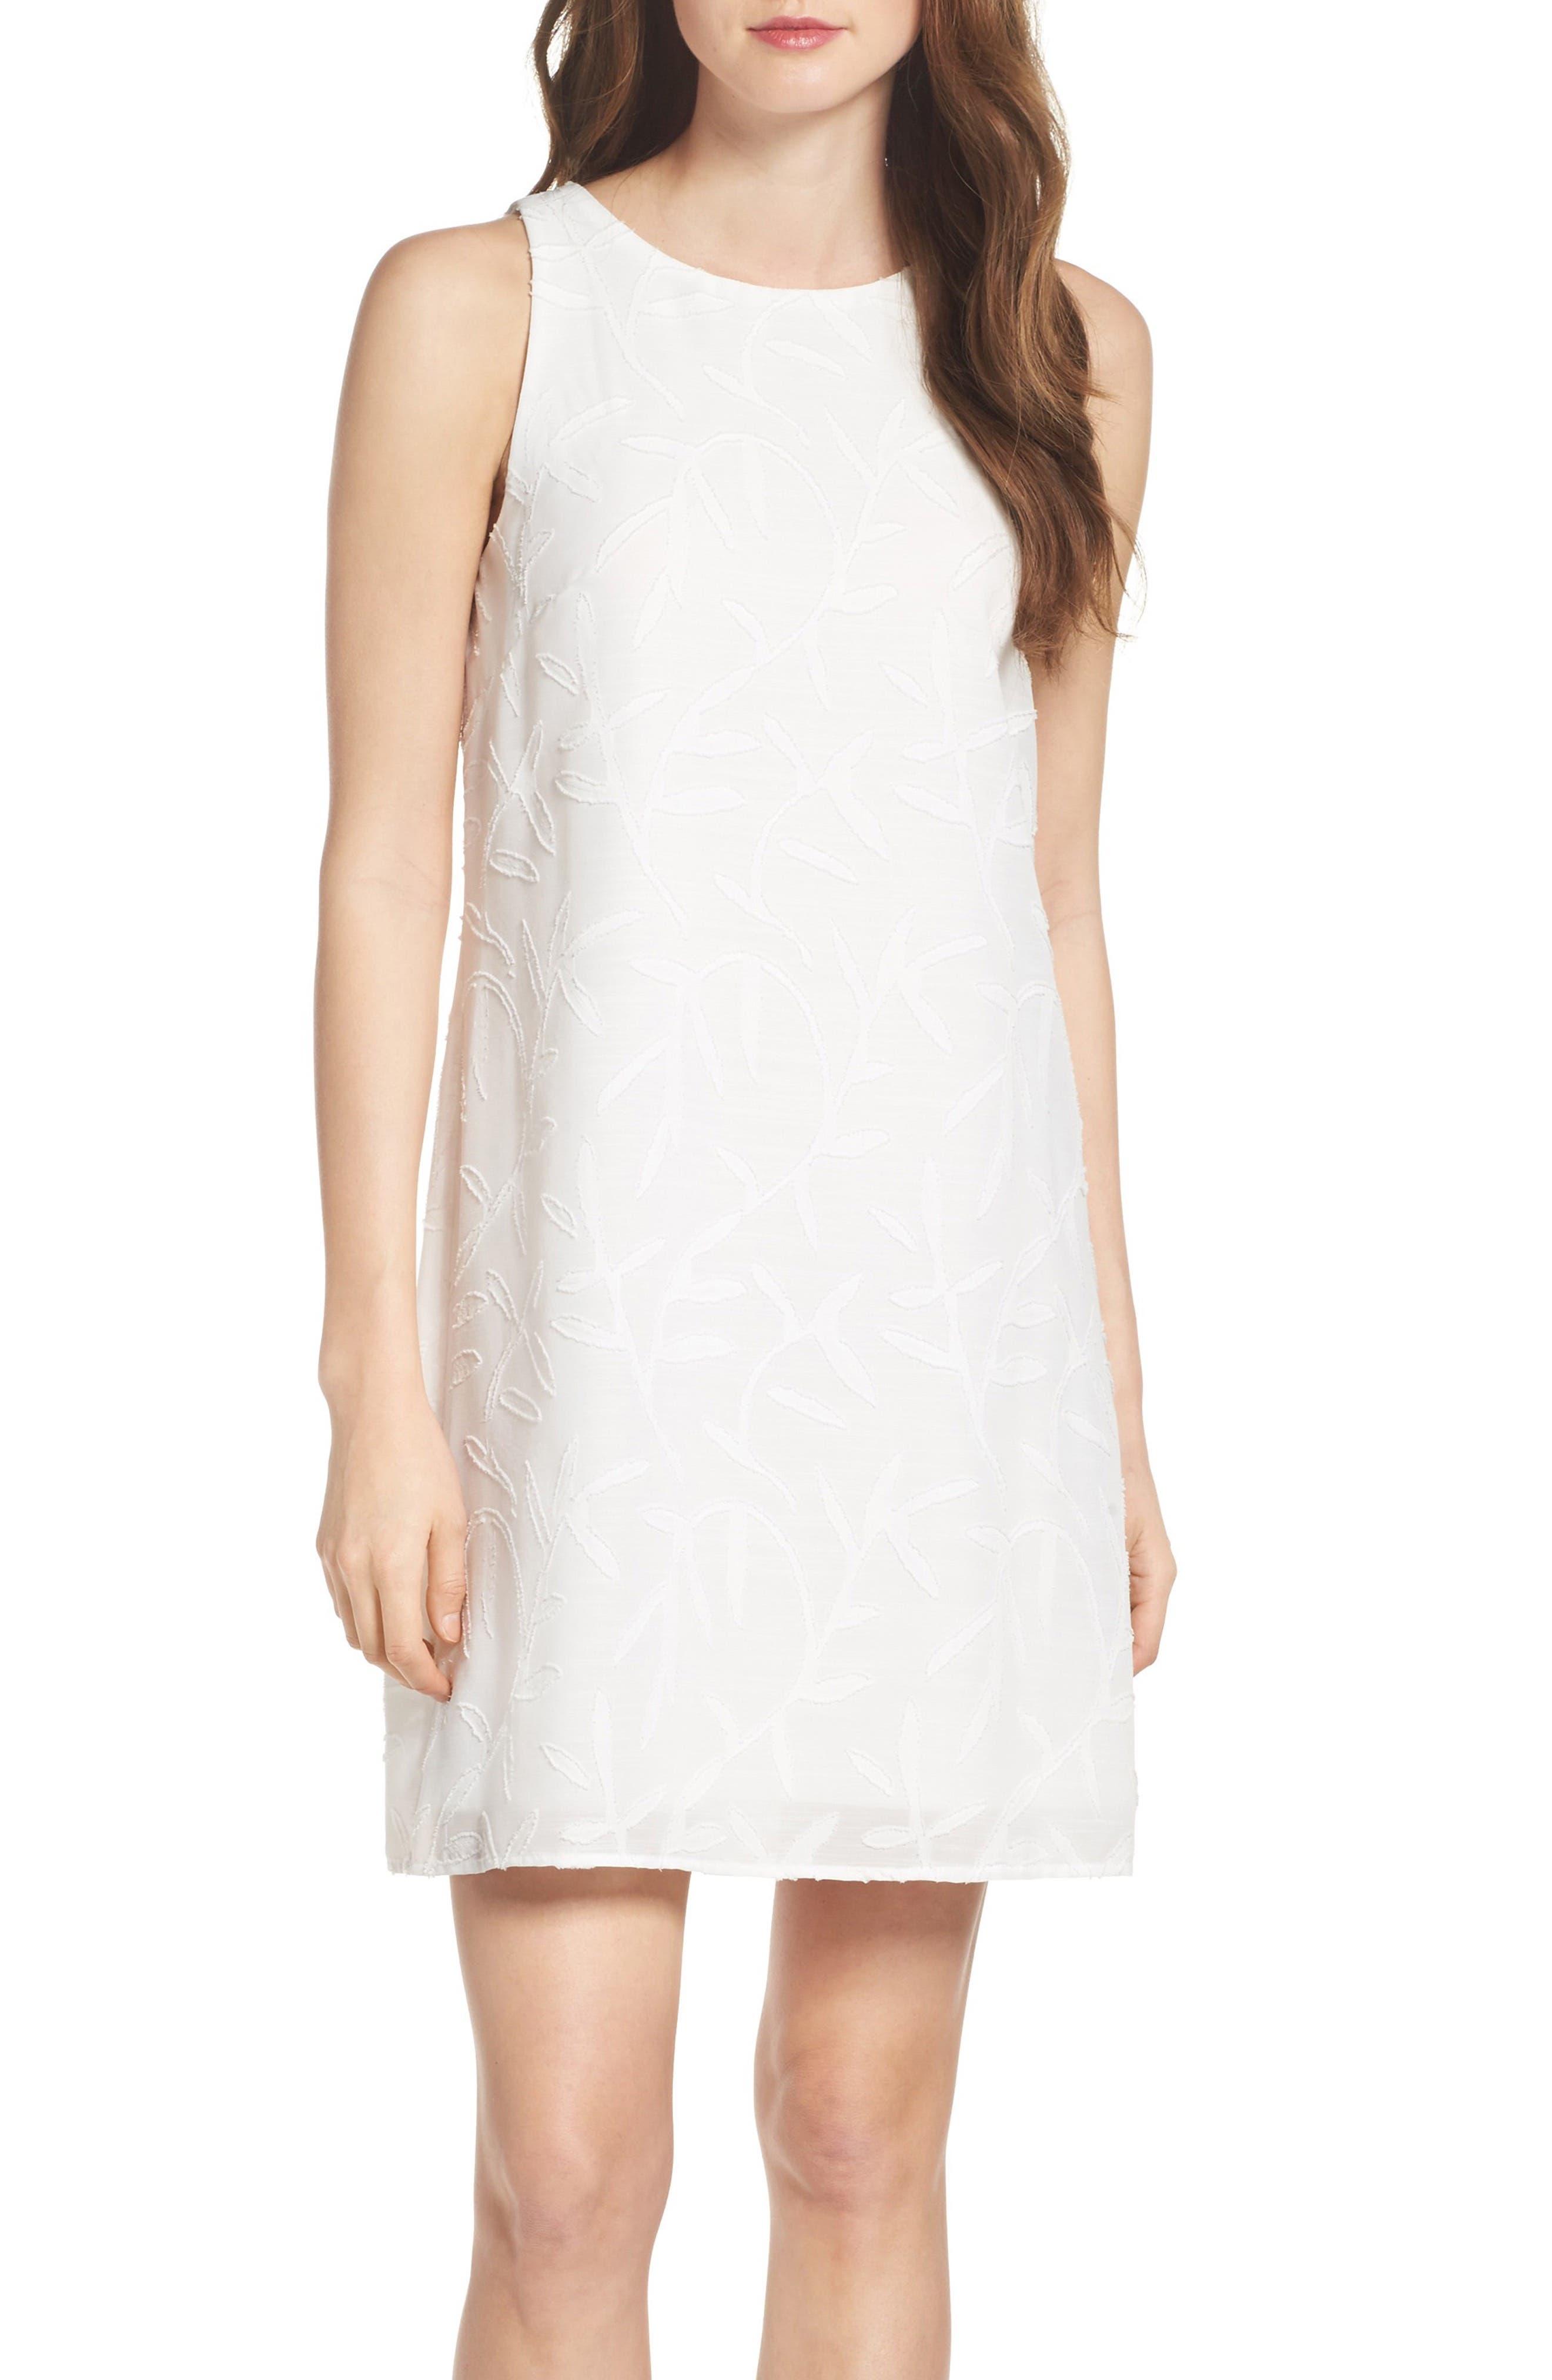 BETSEY JOHNSON Clipped Jacquard Shift Dress, Main, color, 900